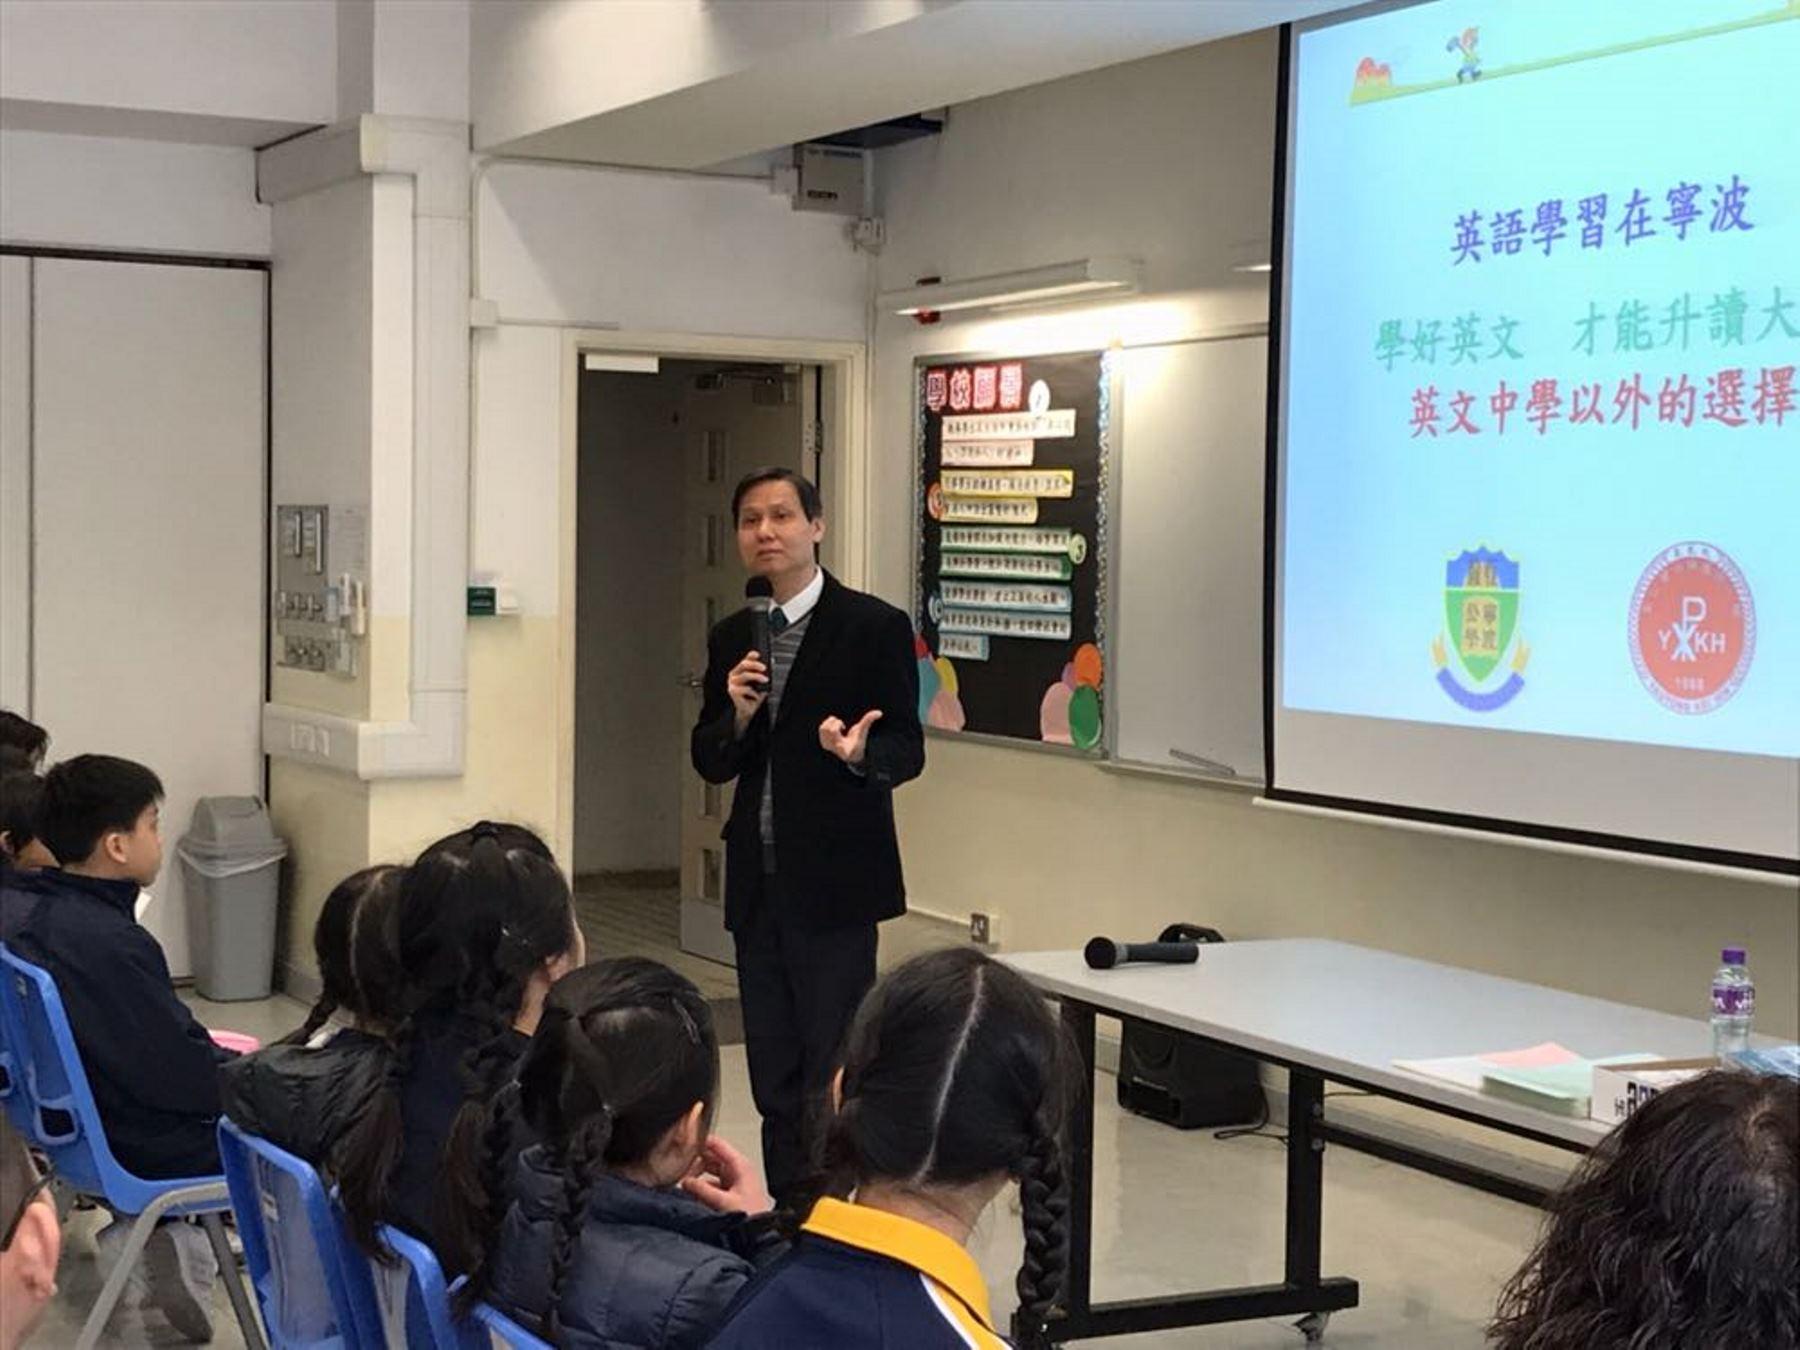 http://npc.edu.hk/sites/default/files/2018-01-11_5.jpg